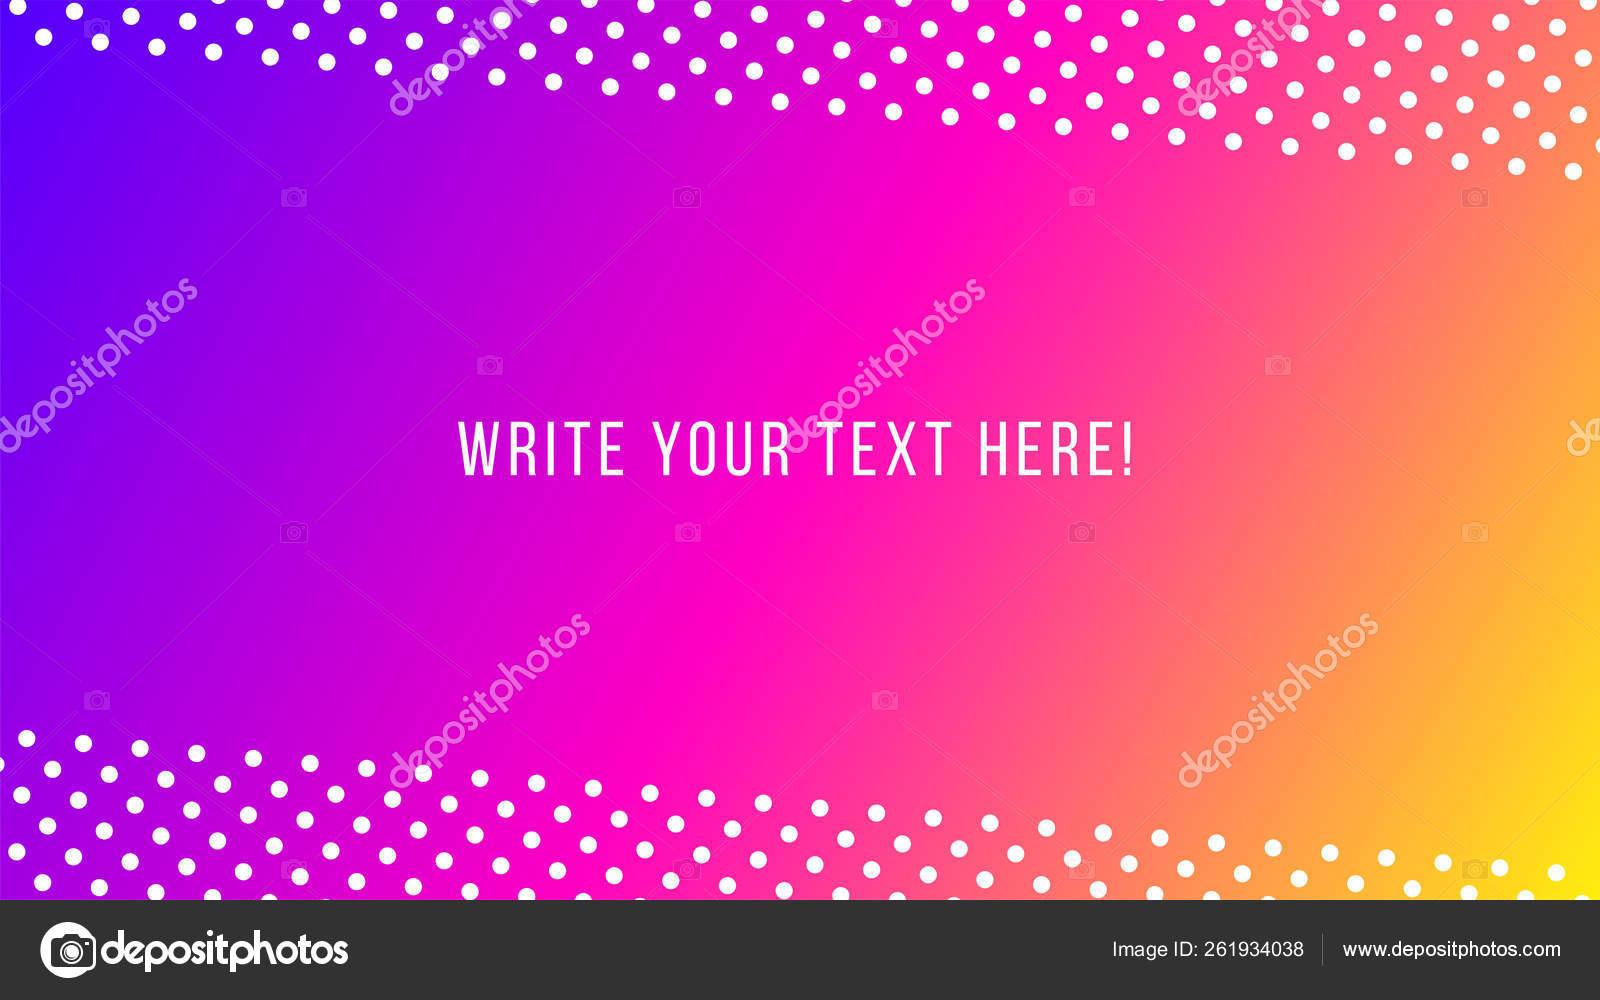 Vaporwave Retrowave Abstract Background Gradient Colorful Shaps Memphis Geometric Elements Stock Vector C V Scaperrotta 261934038